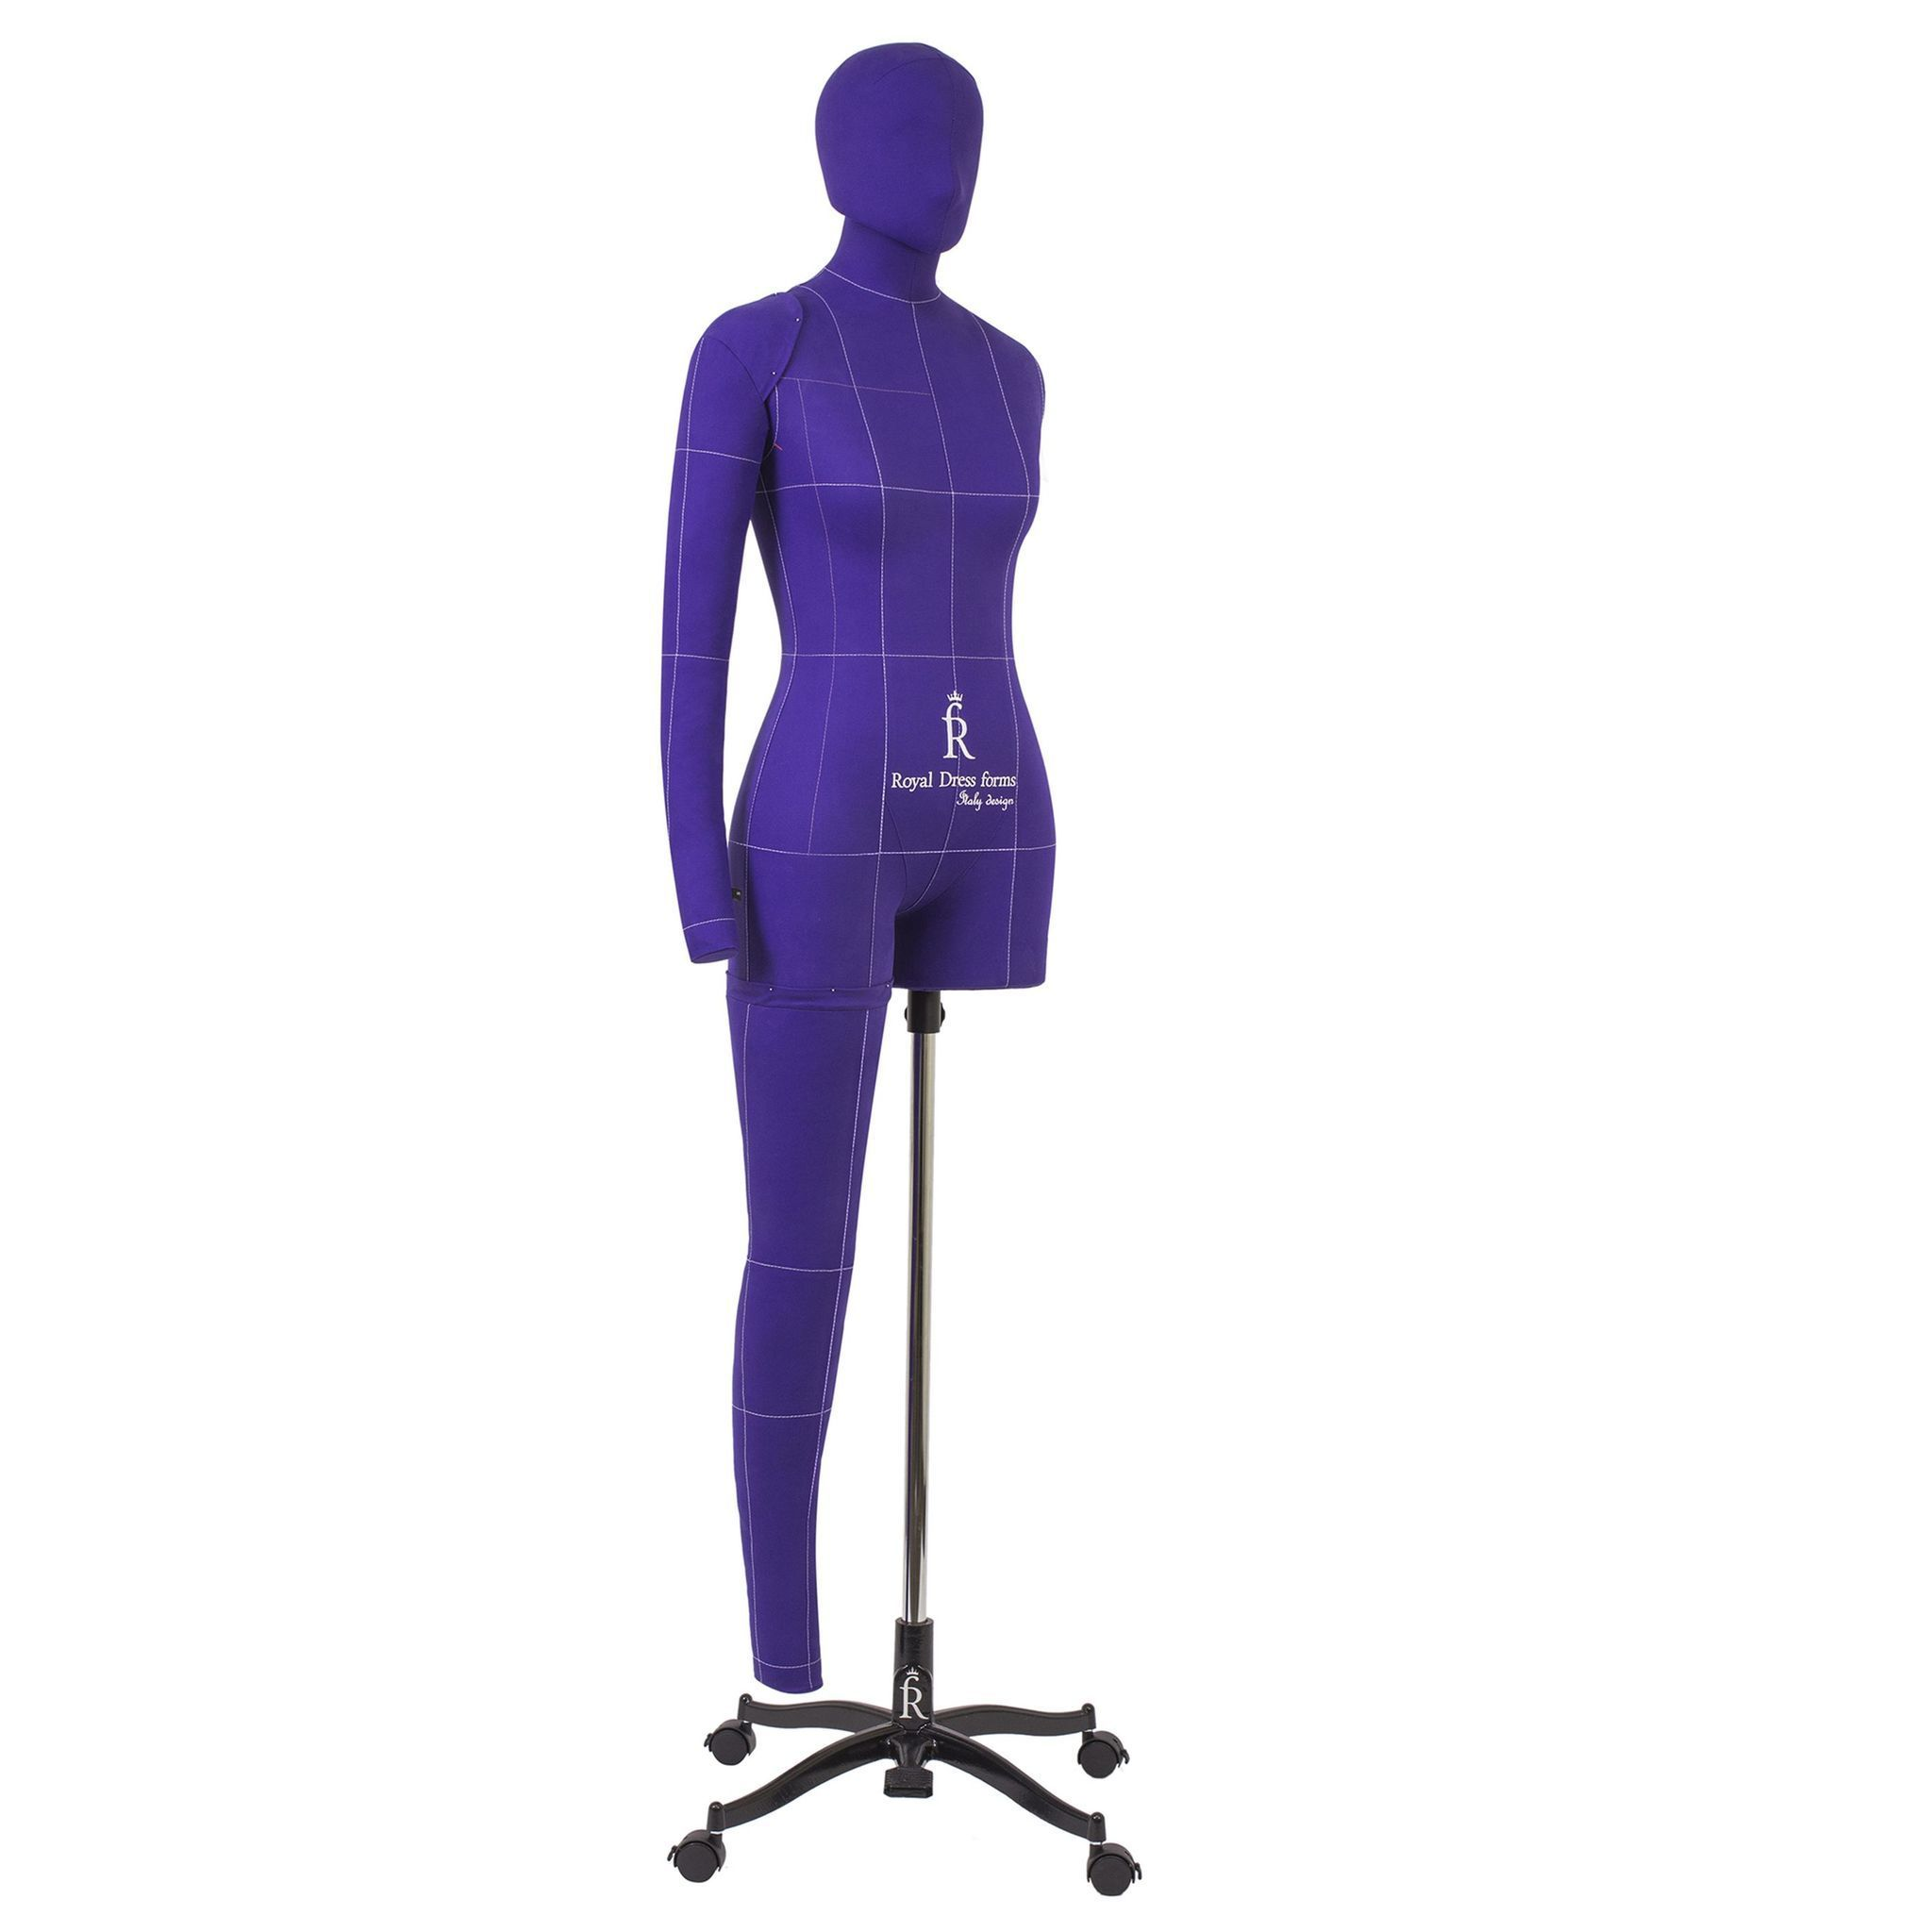 Манекен портновский Моника, комплект Арт, размер 46, ФиолетовыйФото 1